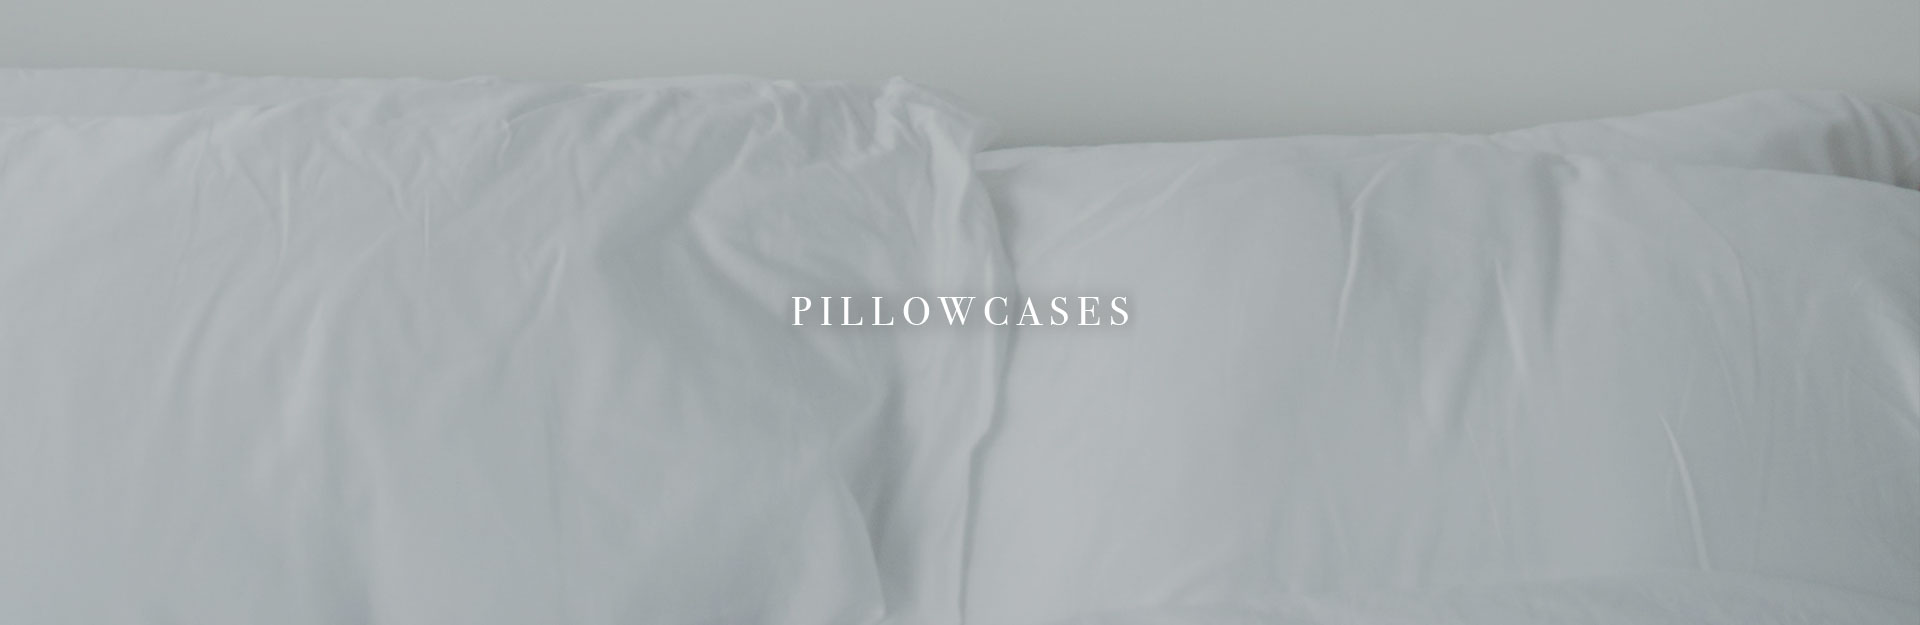 abh-pillowcasesbanner.jpg